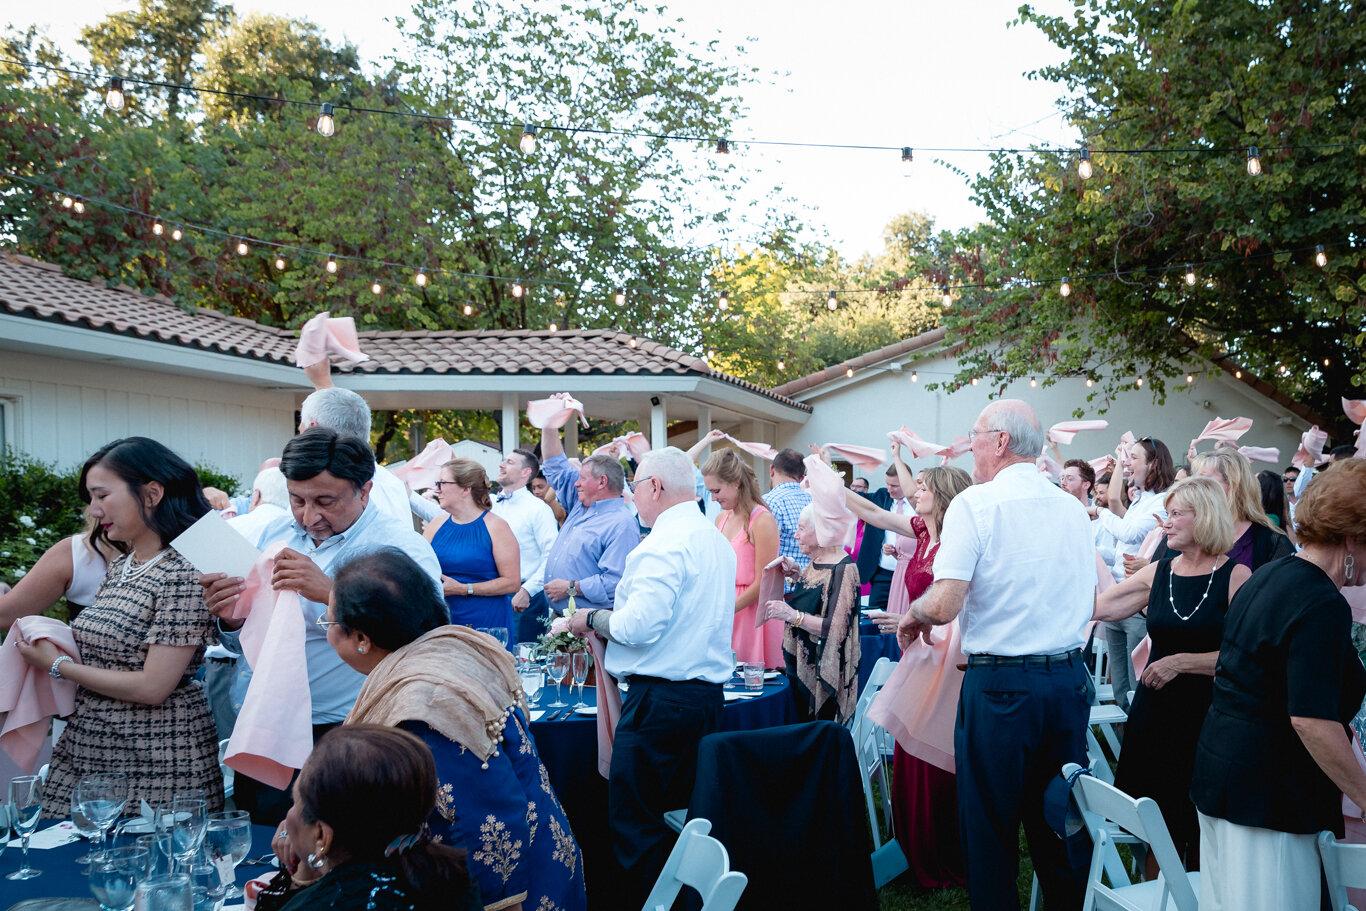 2019.08.24_Emily-Ashir-Wedding-at-the-Maples-6173.jpg